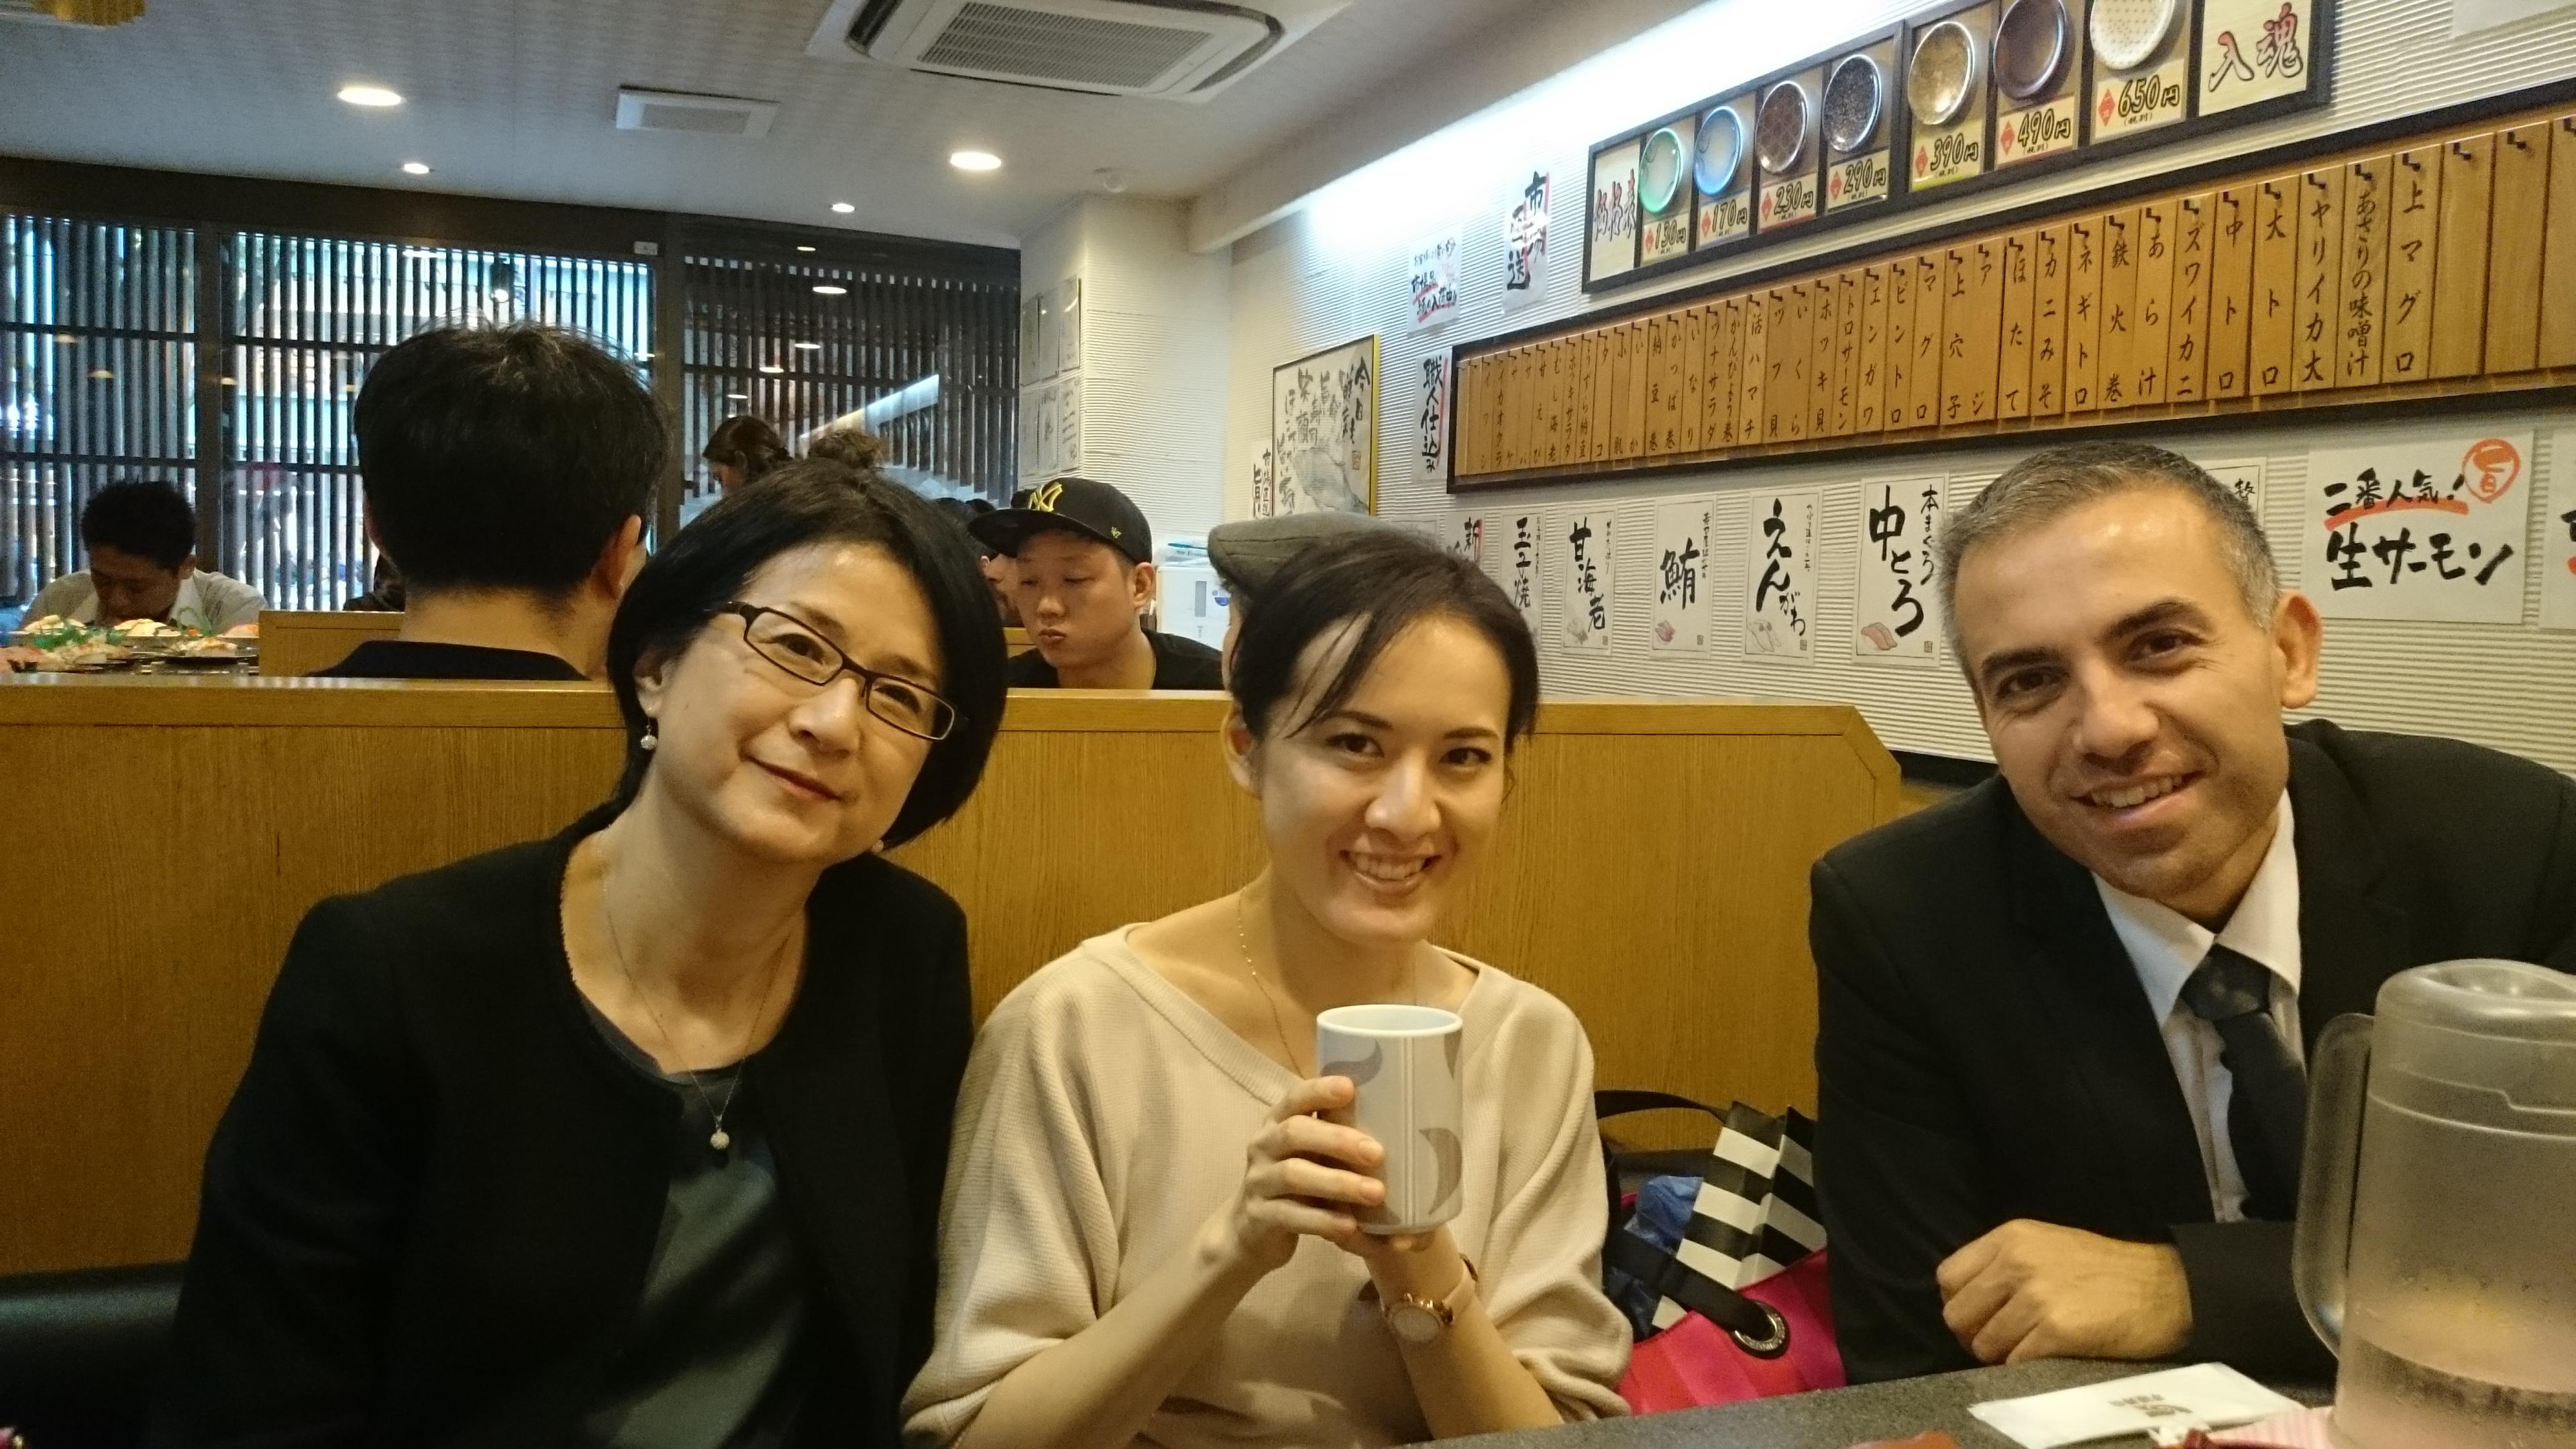 Mariko et Anna Nakagawa, Willy Ippolito , Tokyo, Japon